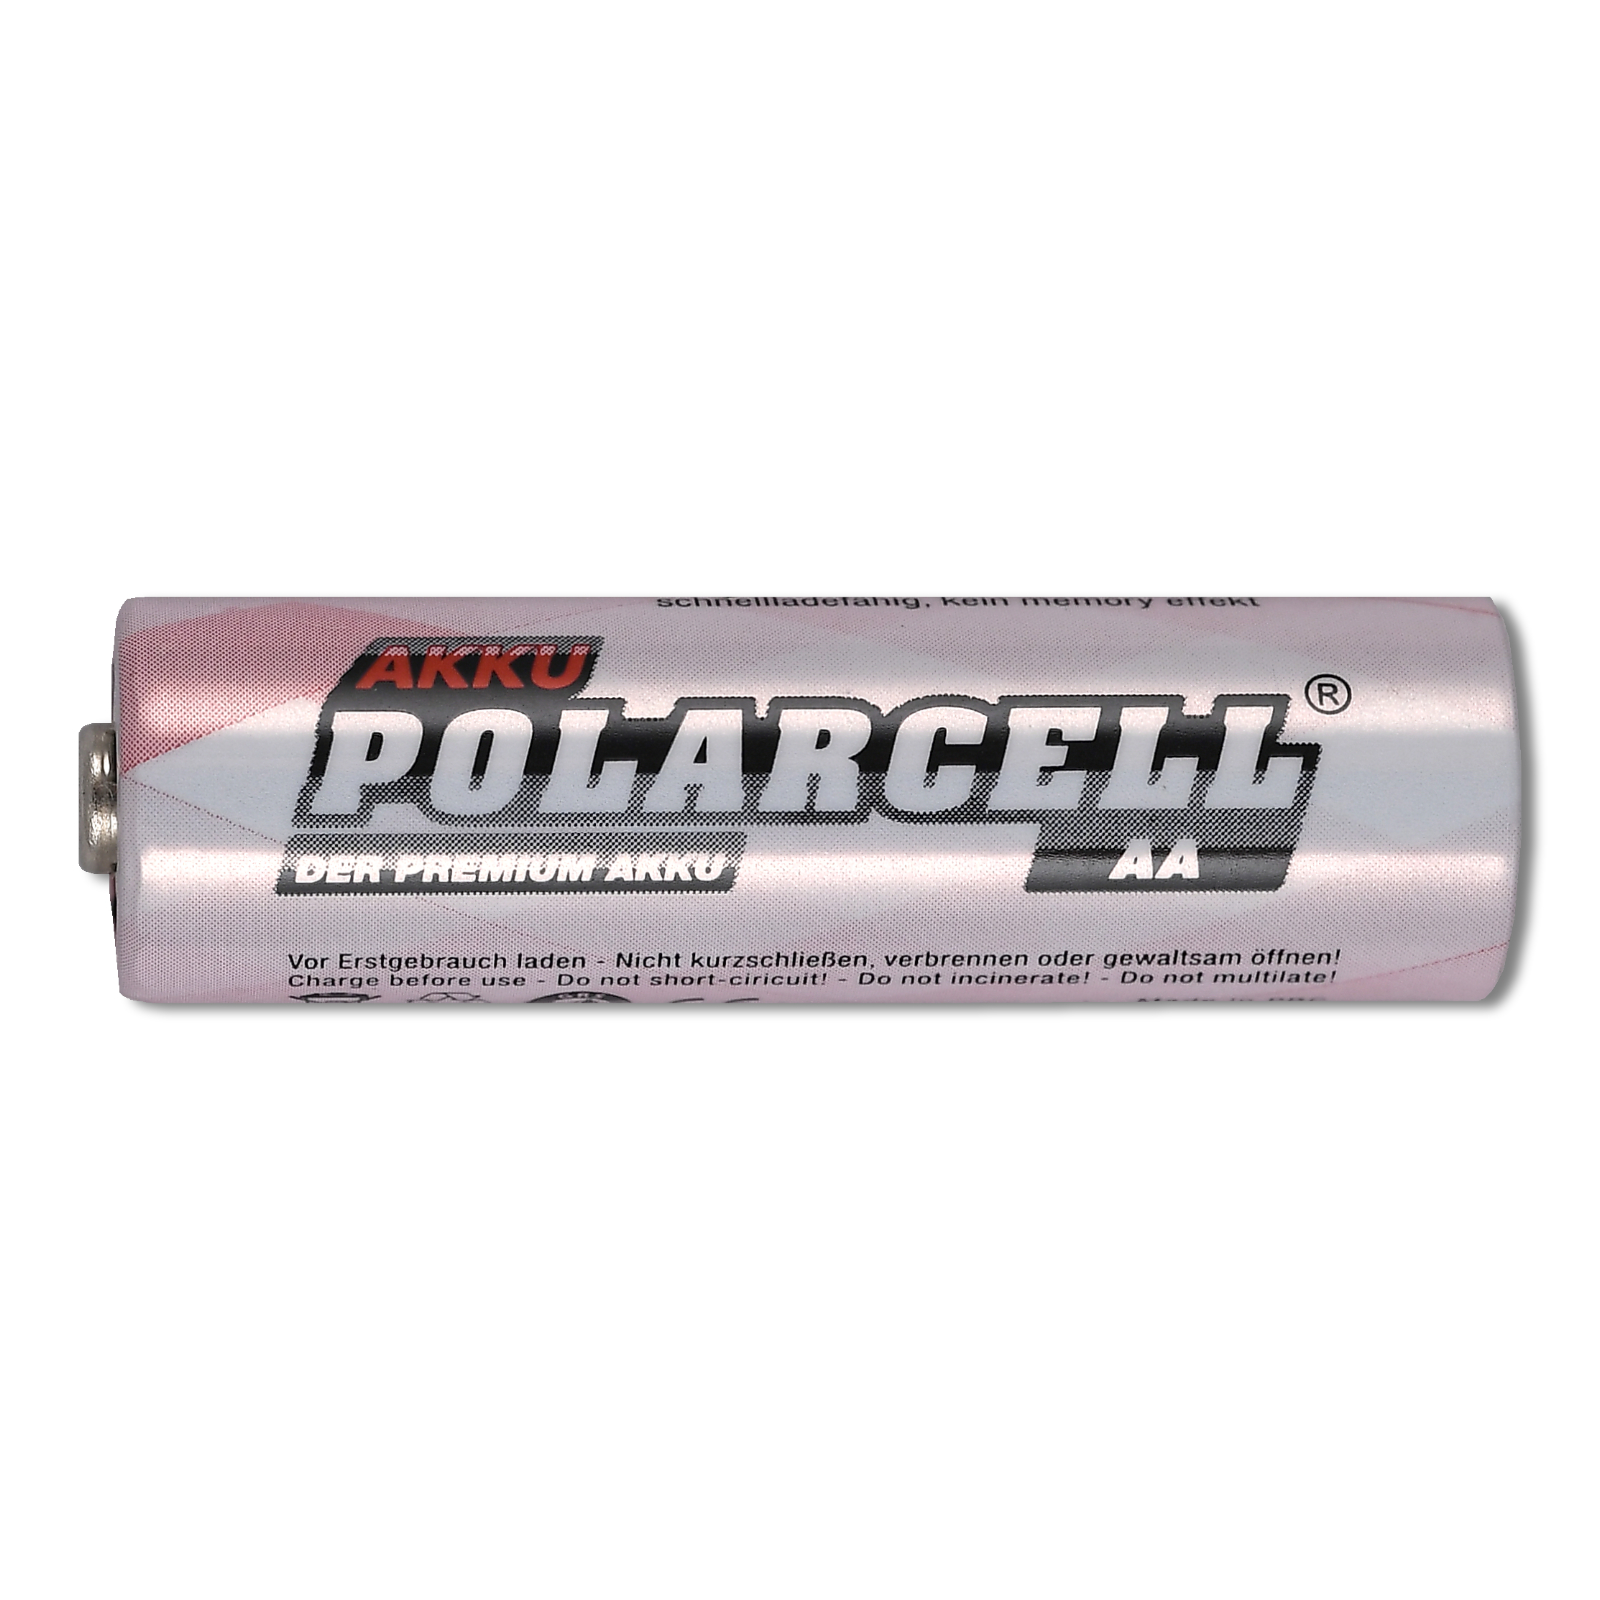 PolarCell AA Mignon HR6 HR6 HR6 Premium Akku Ni-MH Accus aufladbare Batterien RTU Akkus  | Vielfalt  5f46df